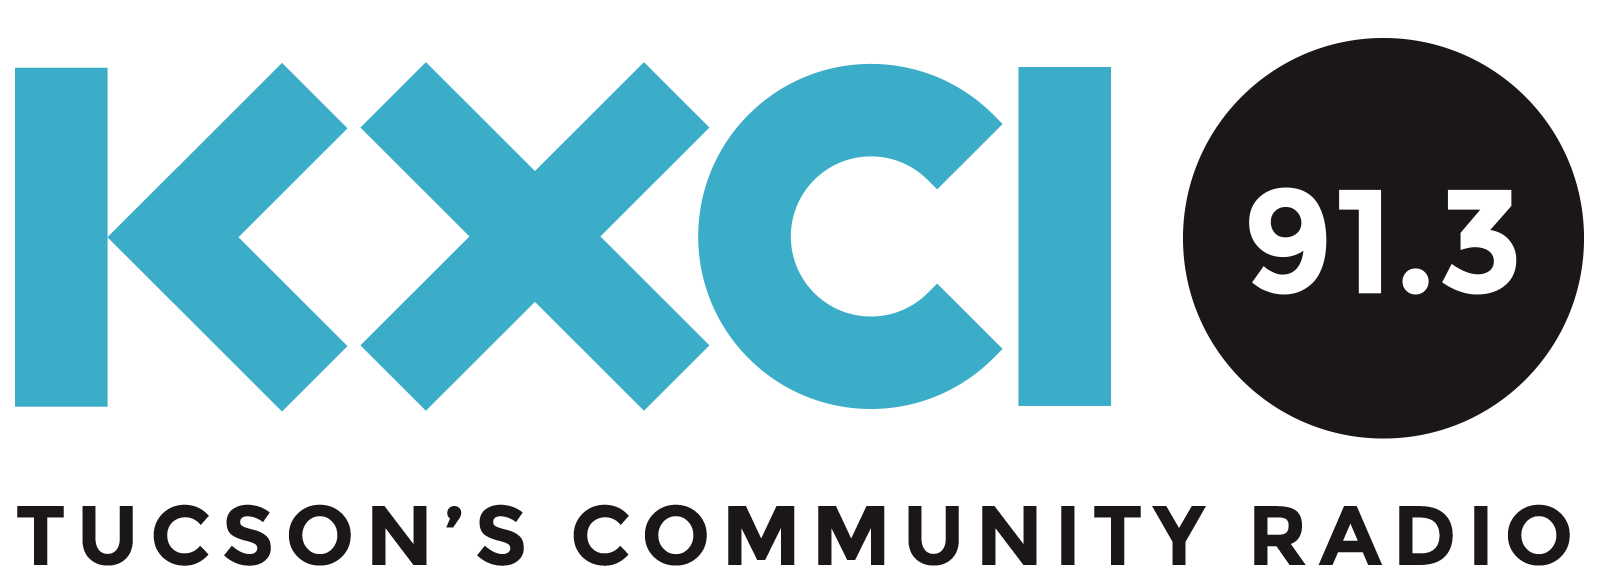 1514334828-kxci_logo_slogan.png